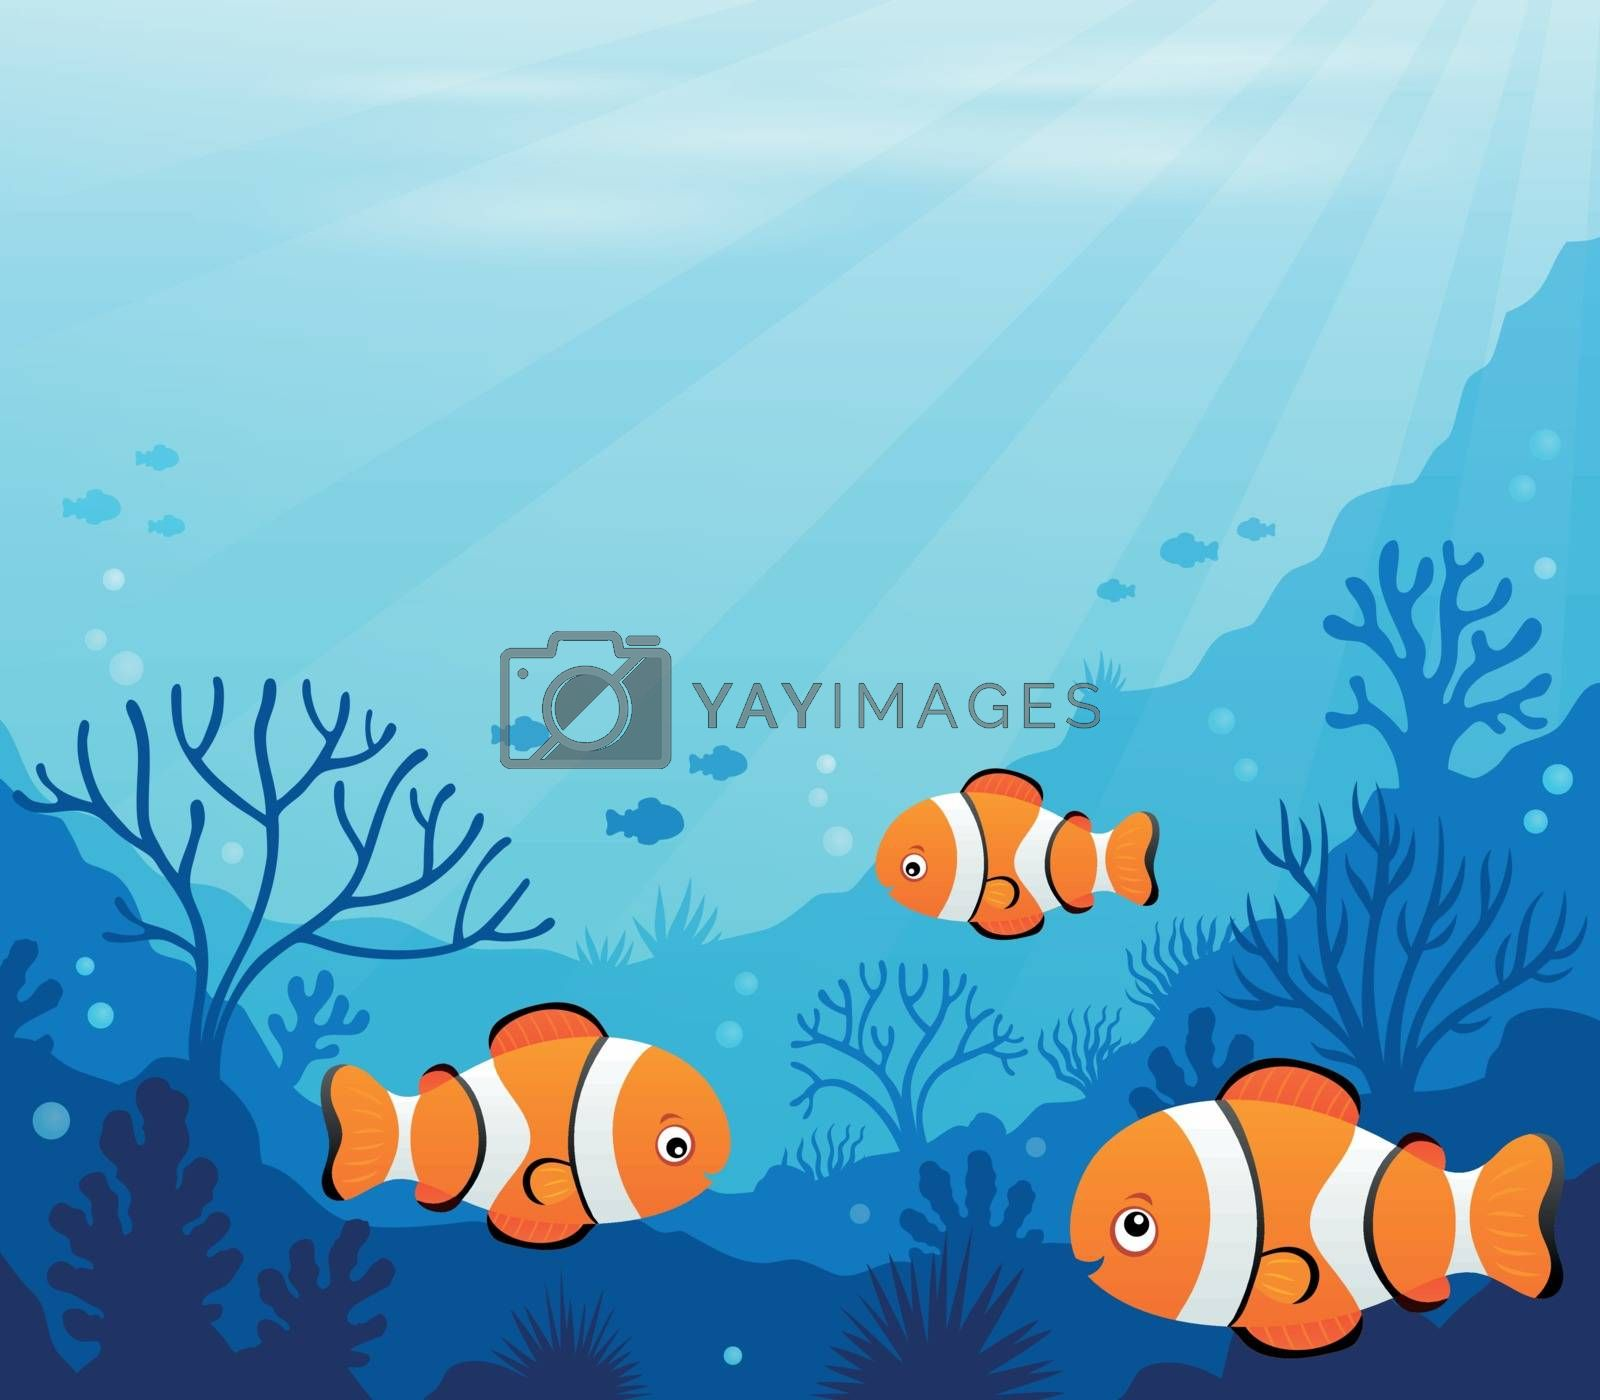 Ocean underwater theme background 7 - eps10 vector illustration.